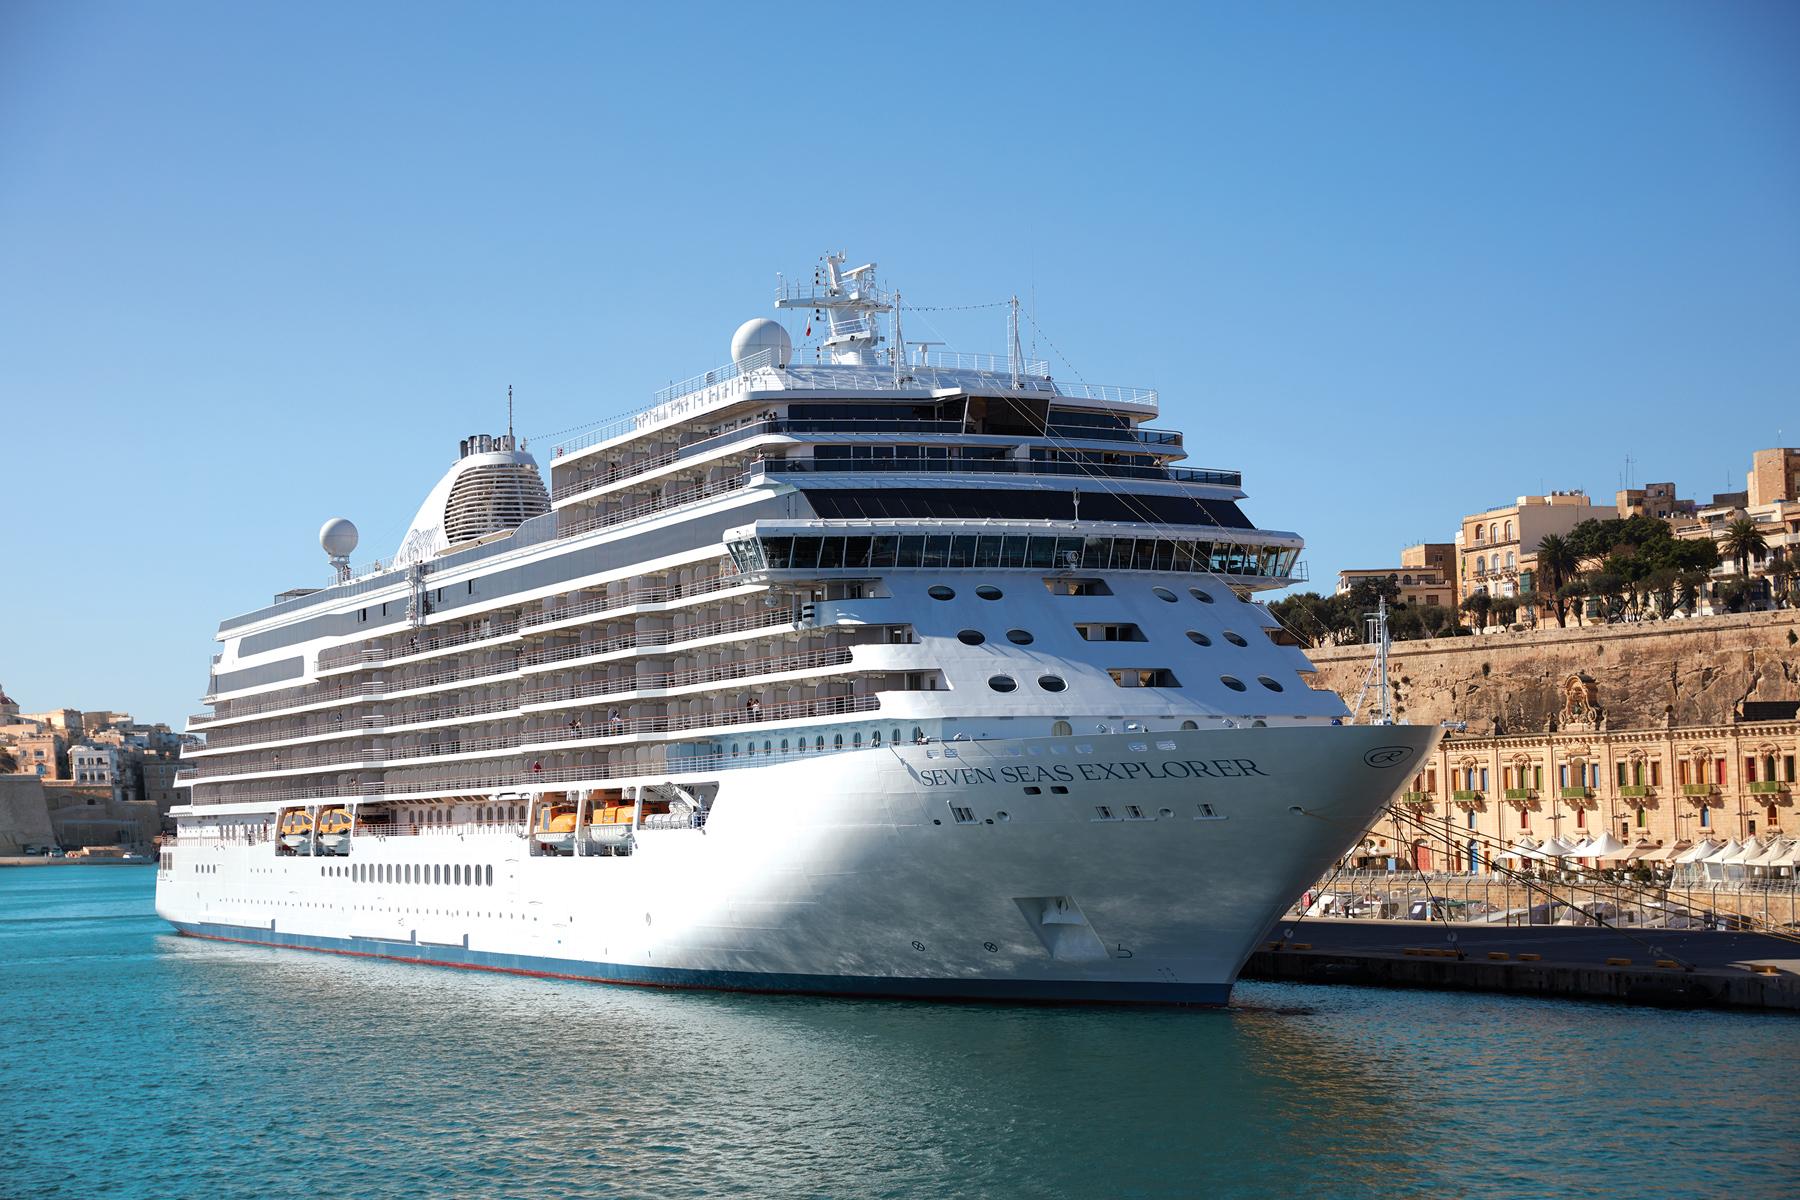 Regent Seven Seas Cruises Announces Full Return to Sailing Around the World Starting This Fall